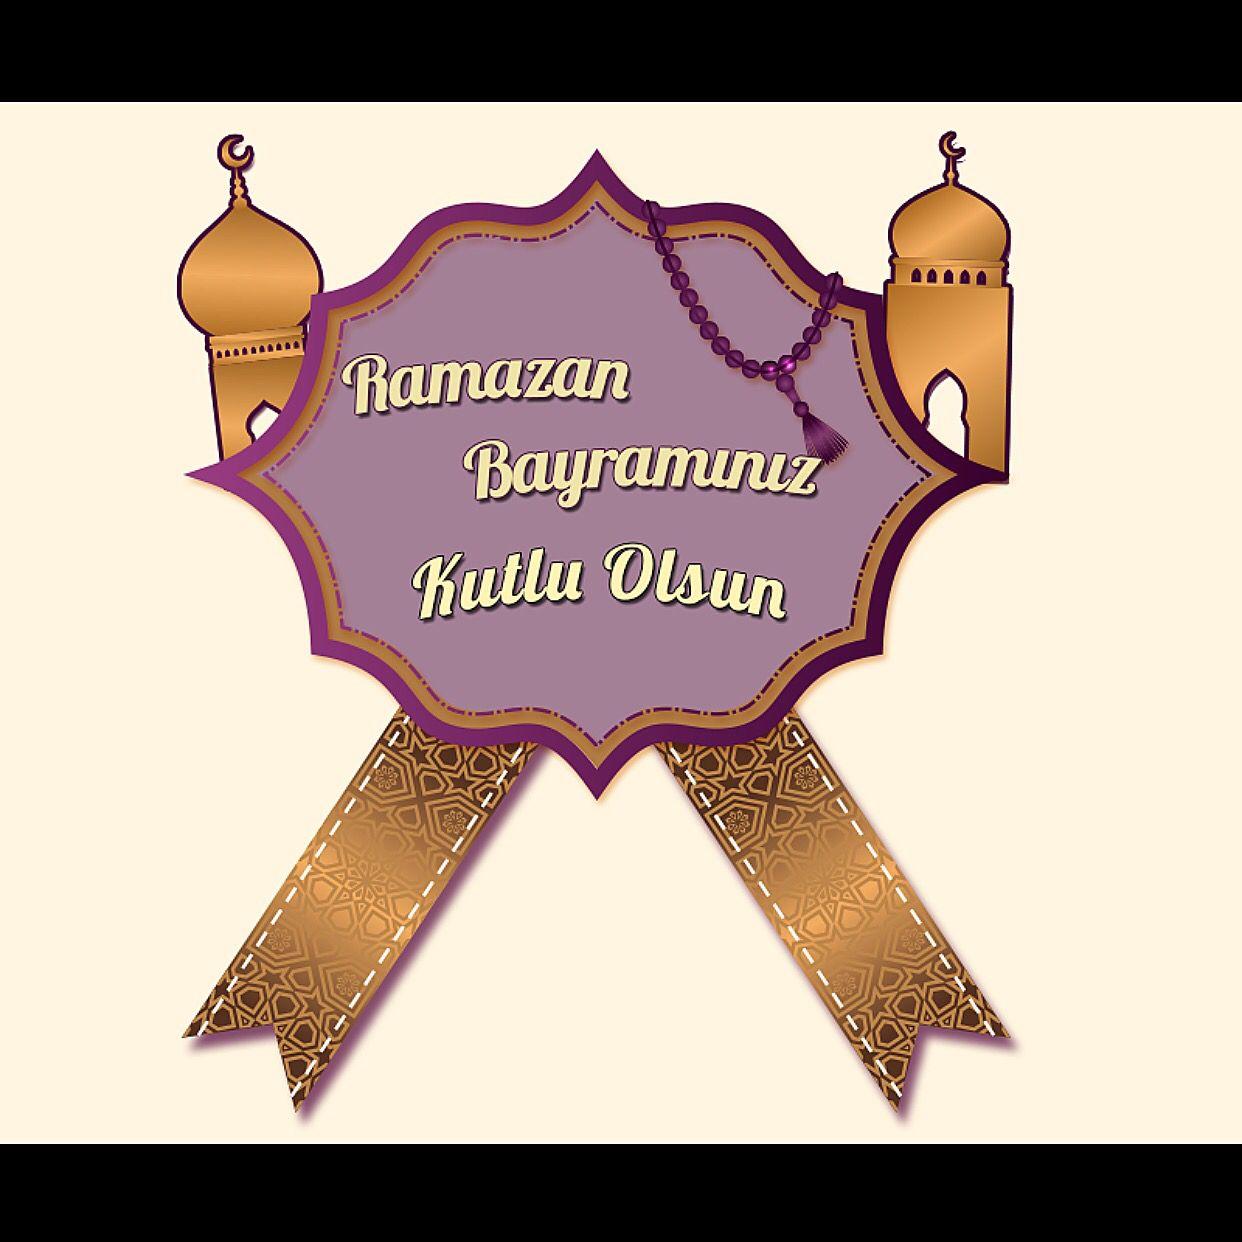 Bayram Afişi Ramazan Bayramı Christmas Ornaments Ornaments Ve